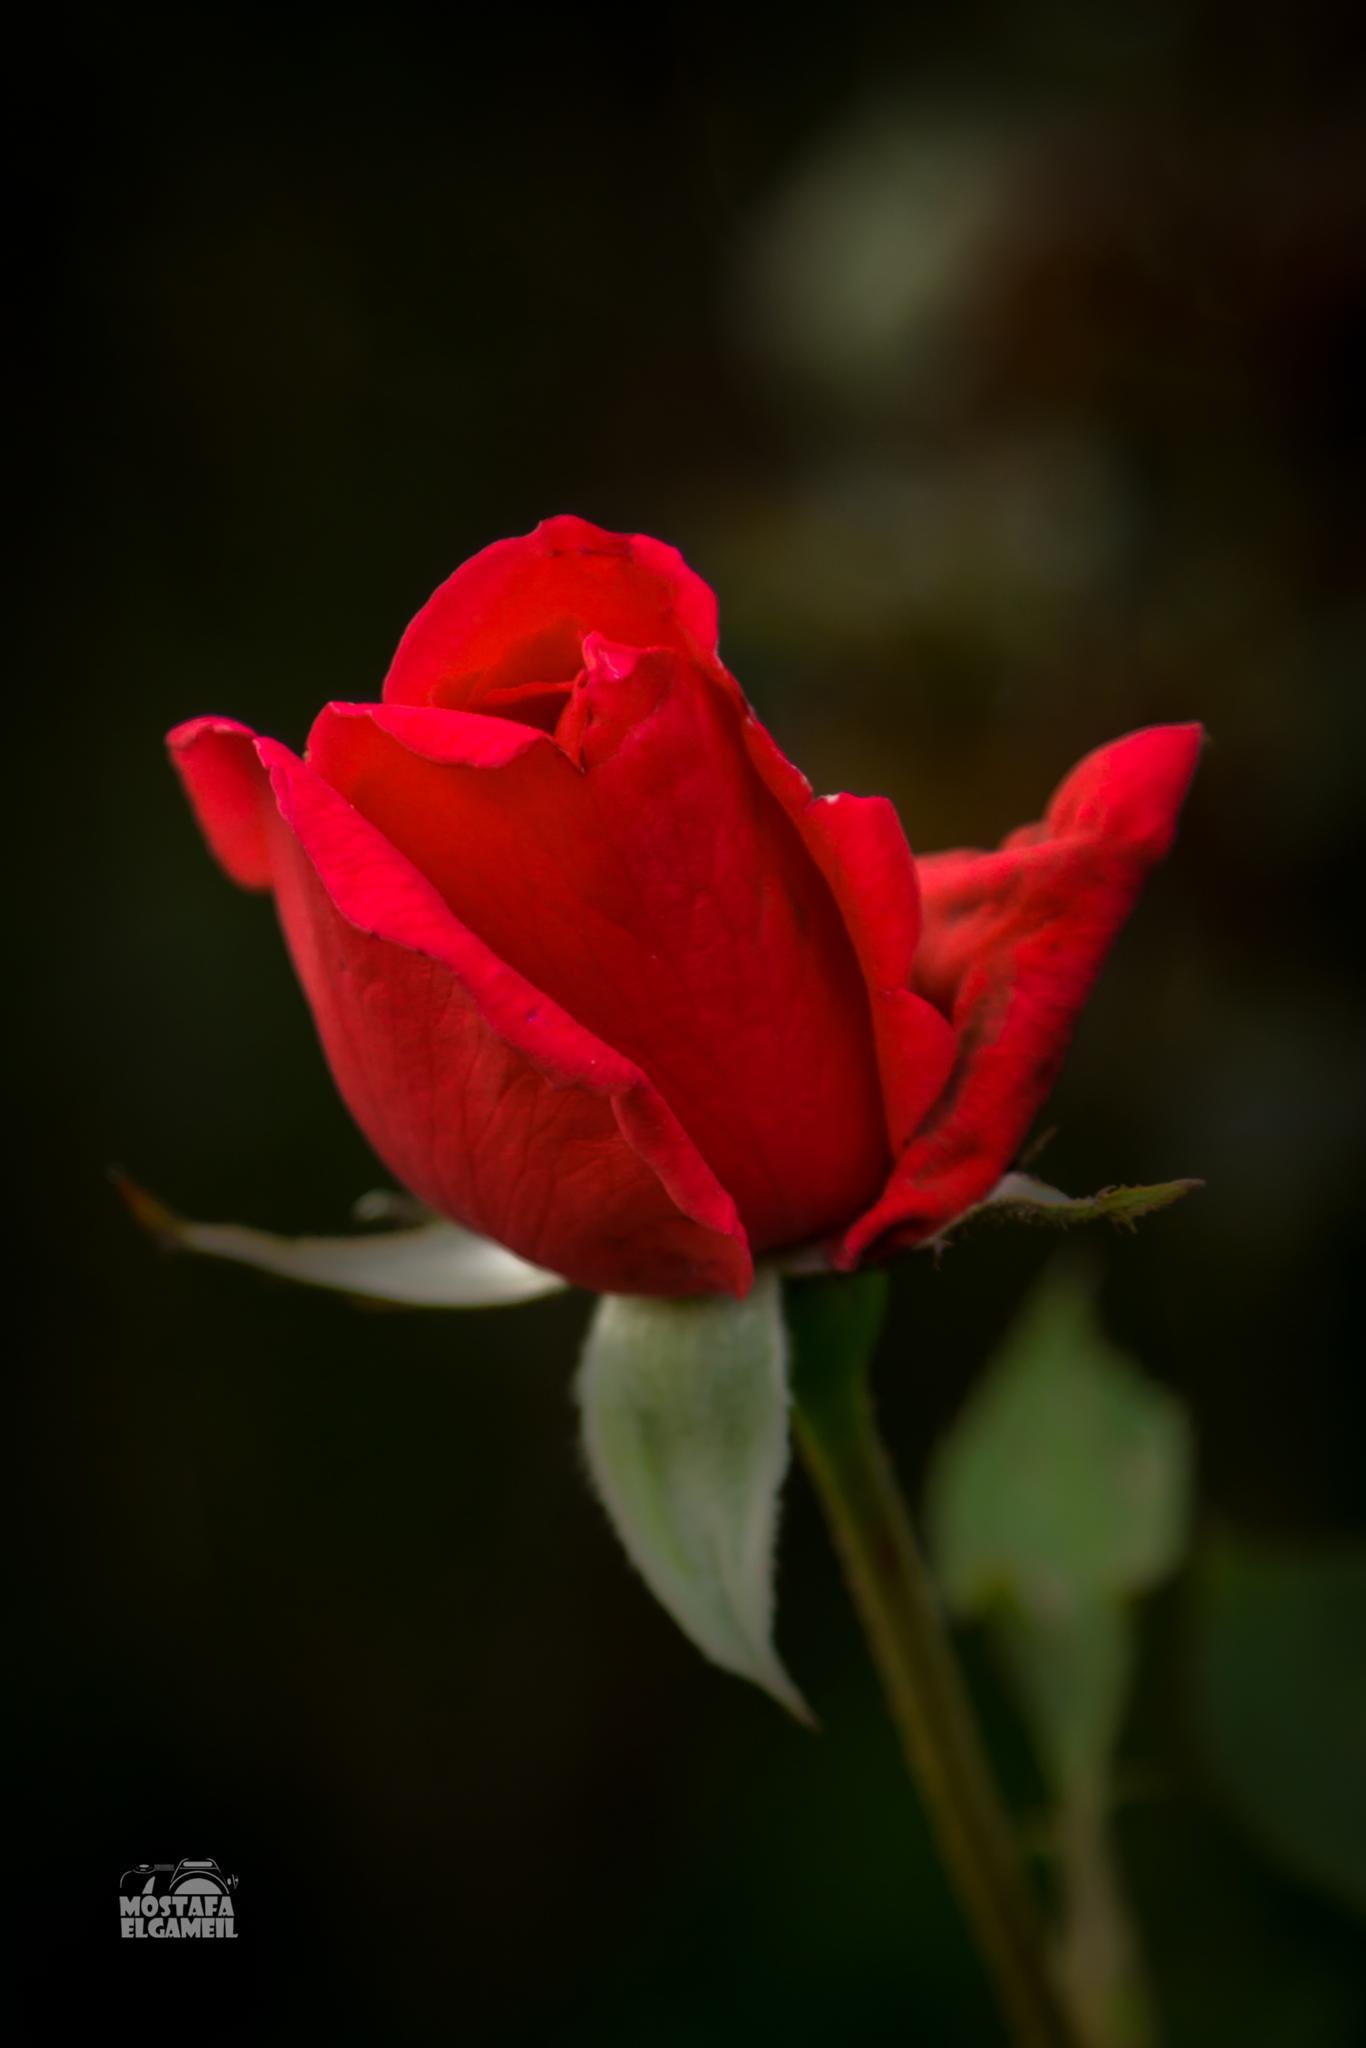 red romance by Mostafa ElGameil